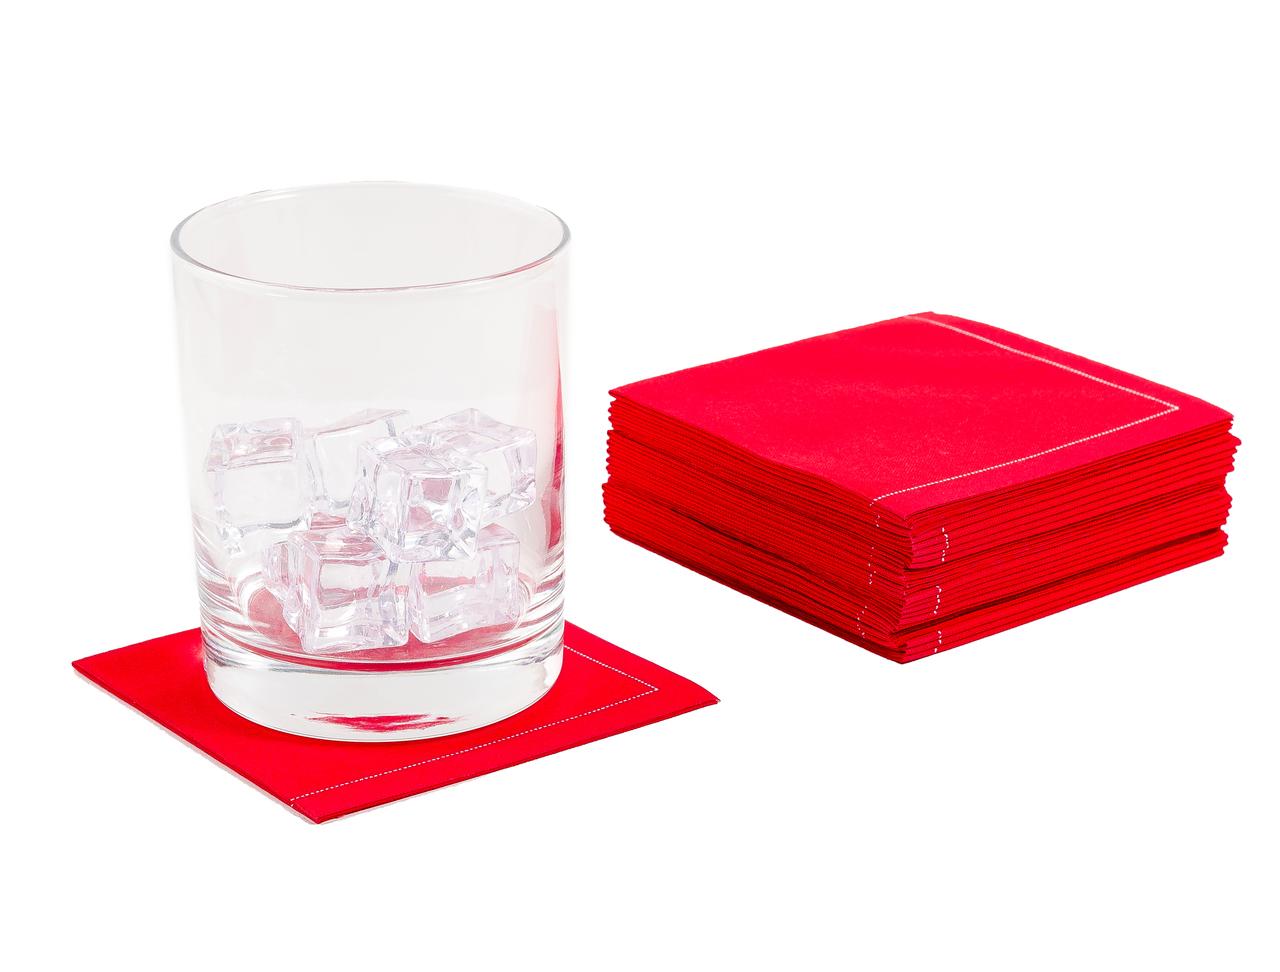 "Toreador Cotton 1/4 Cocktail - 8"" x 8"" (folded 4"" x 4"") - 30 units"